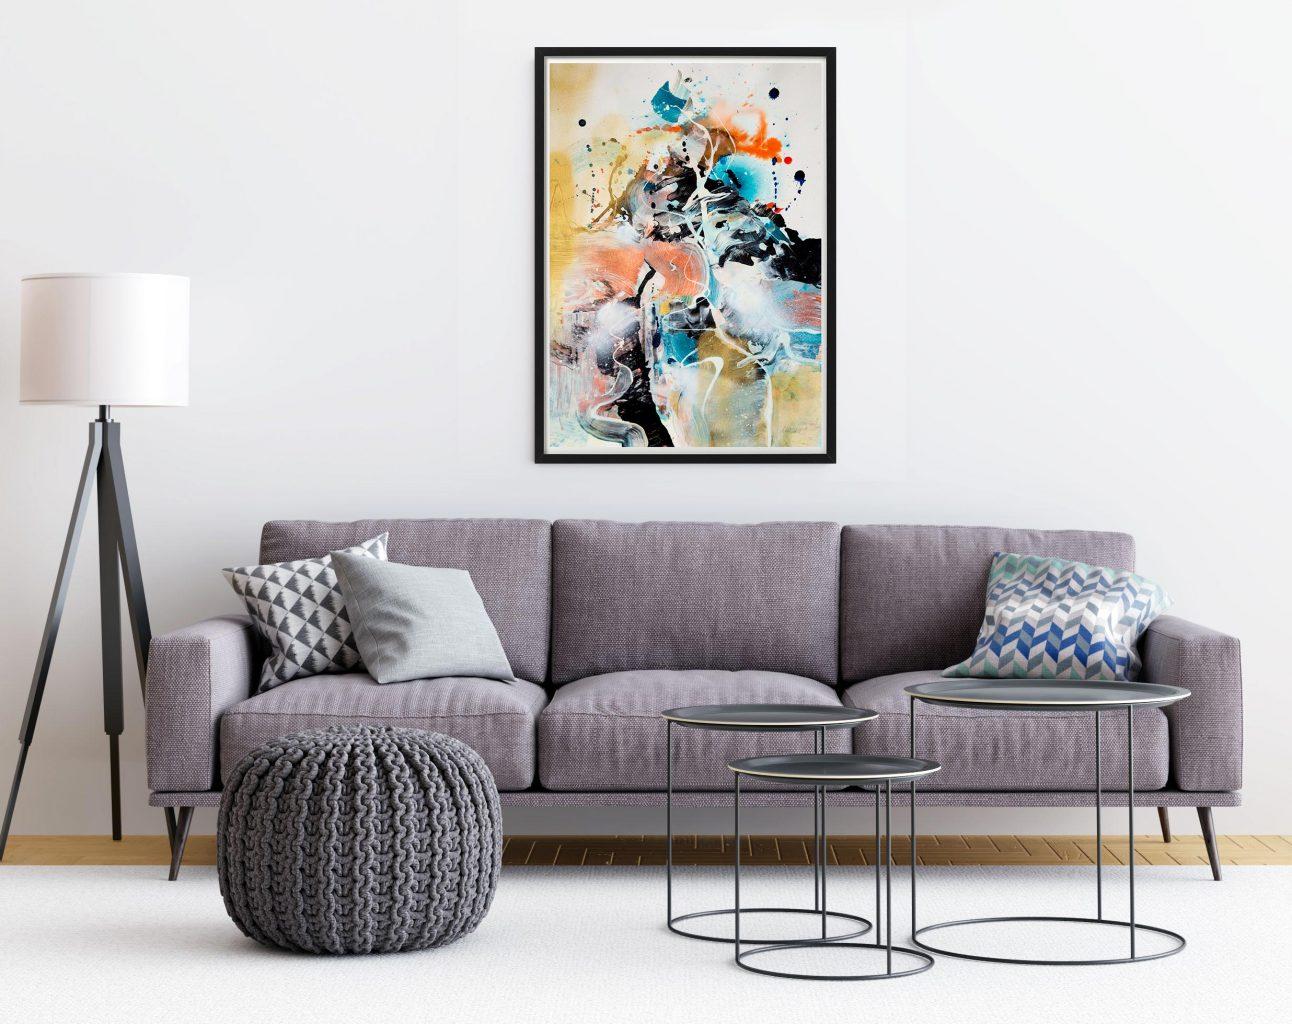 Jazz - original painting by Milena Gaytandzhieva, mixed media